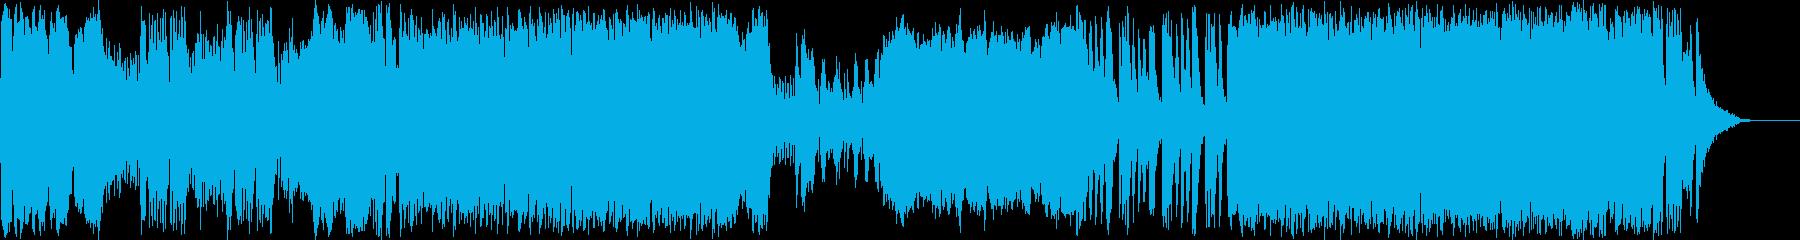 CHINESE DRAGONの再生済みの波形